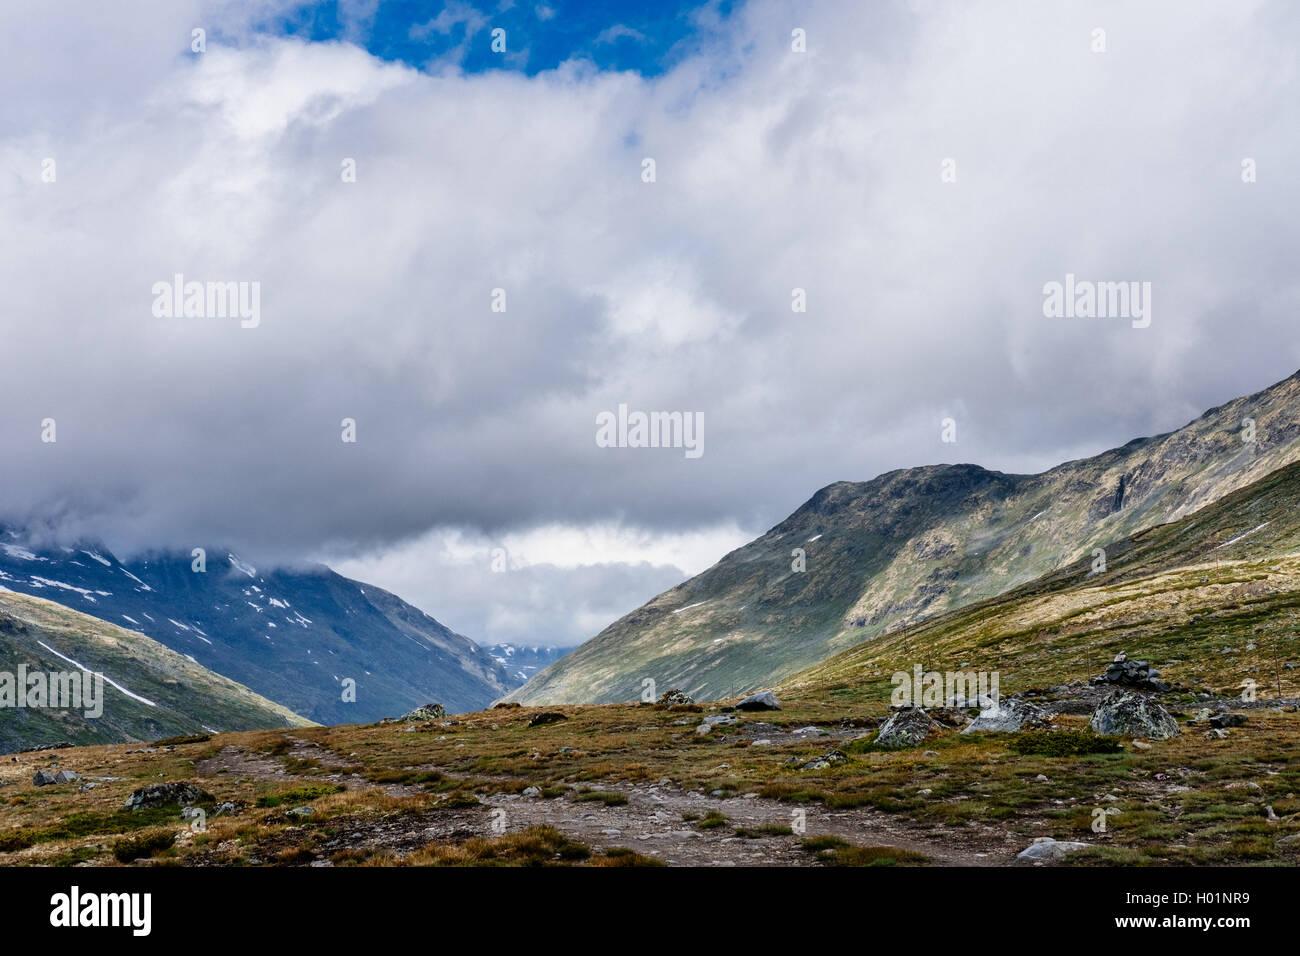 Leirvassbu, Jotunheimen national park Norway - Stock Image